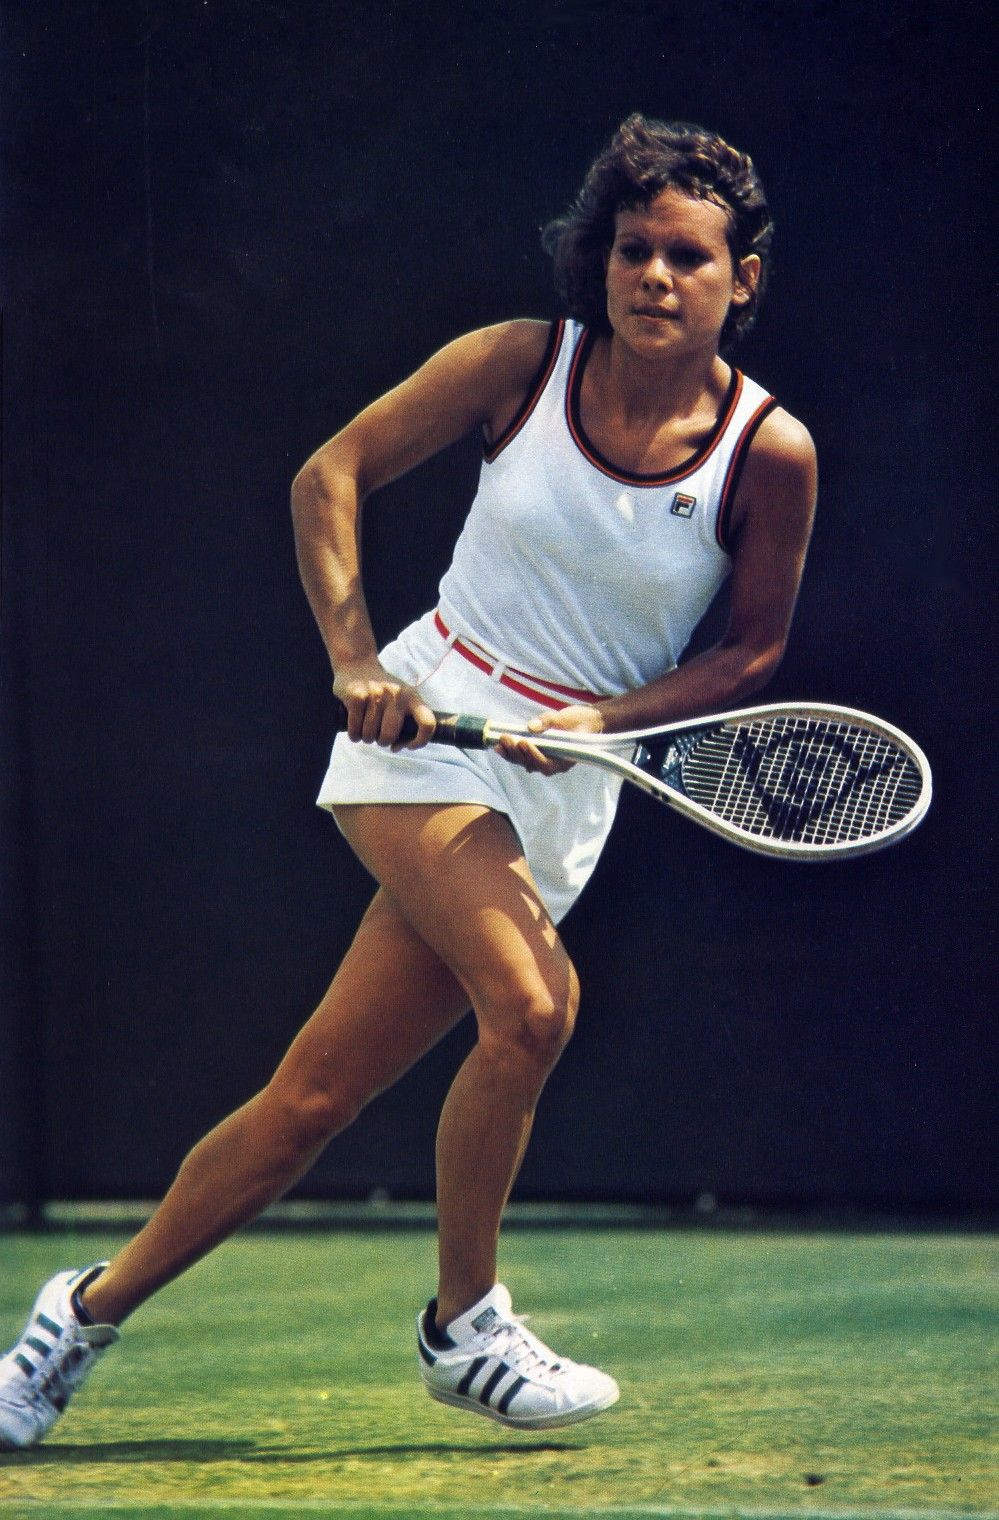 Evonne Goolagong Cawley Australien WTA Tennis